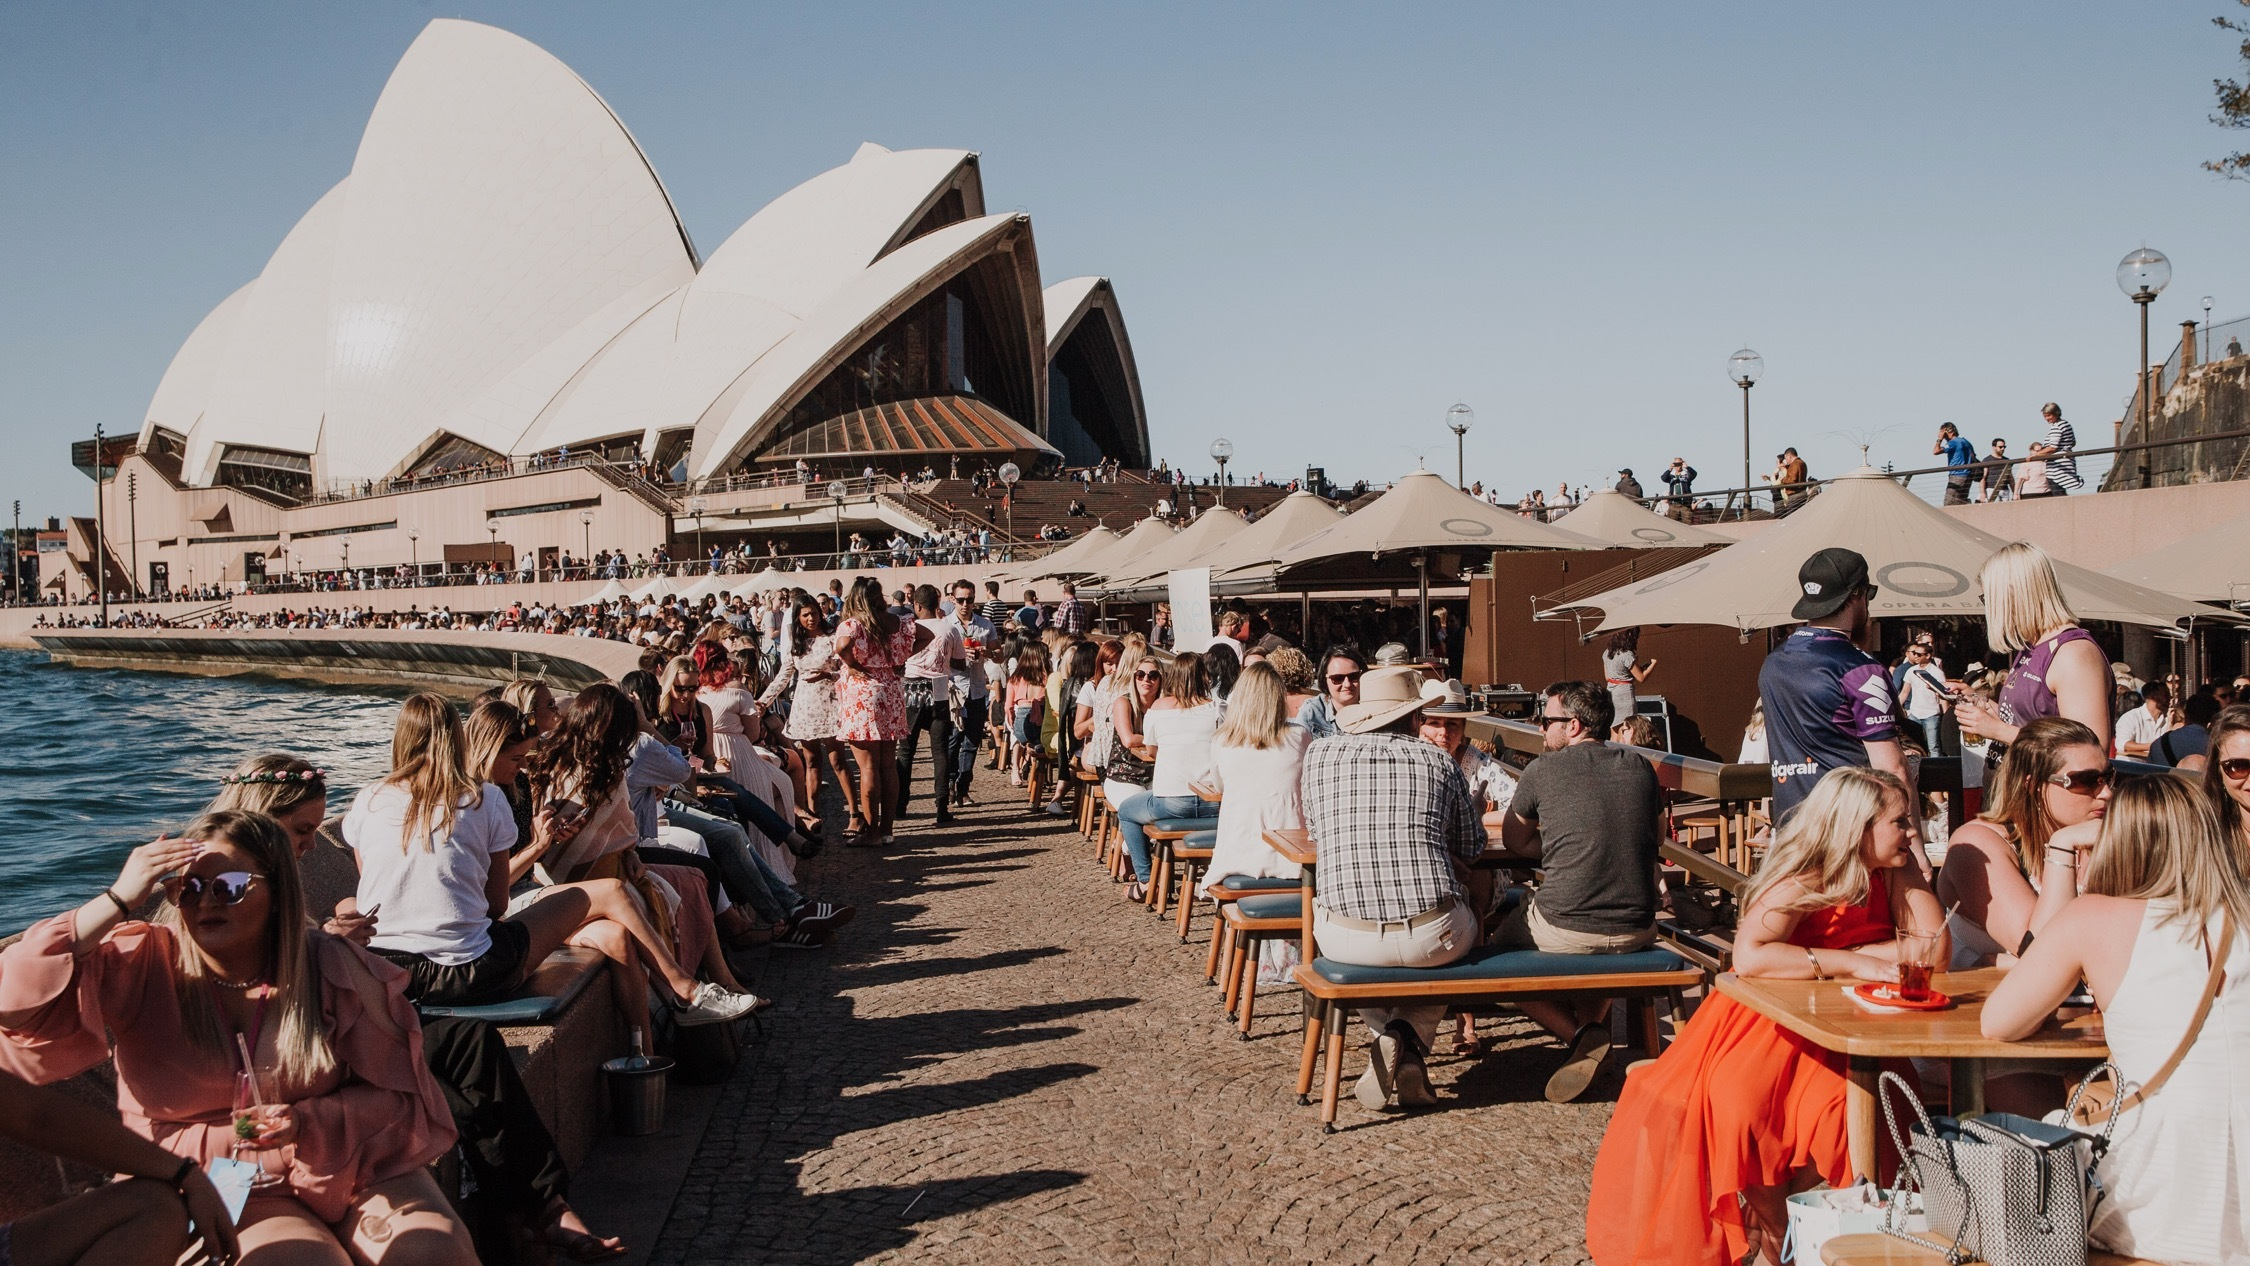 People sitting in sun at Opera Bar Rose Festival